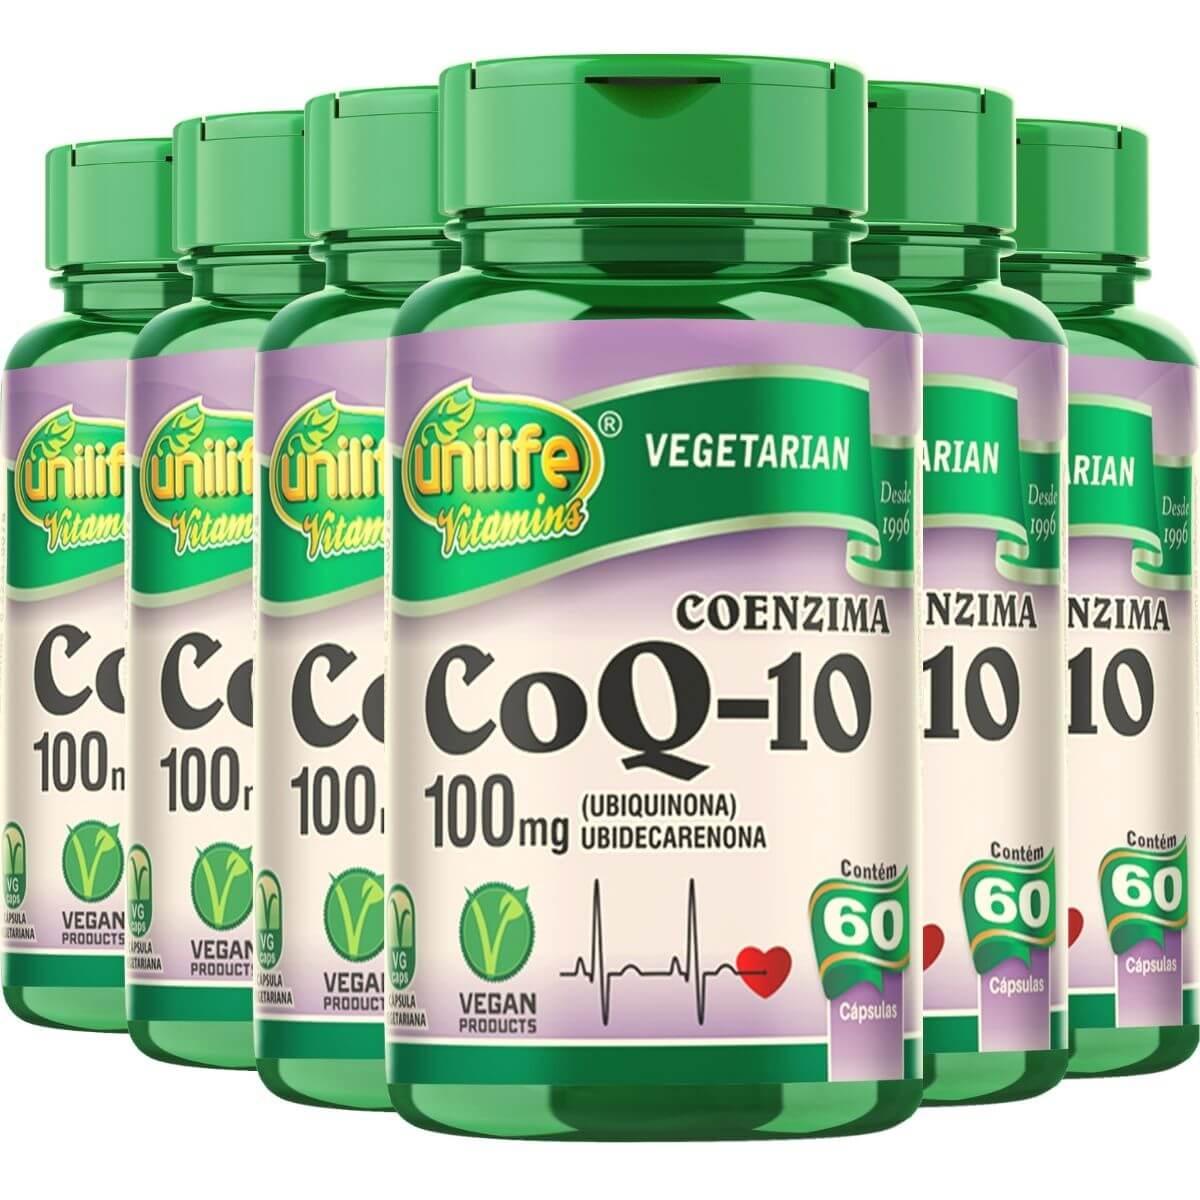 6 x Coenzima Q10 100 Mg 60 Cápsulas Unilife - 12 meses